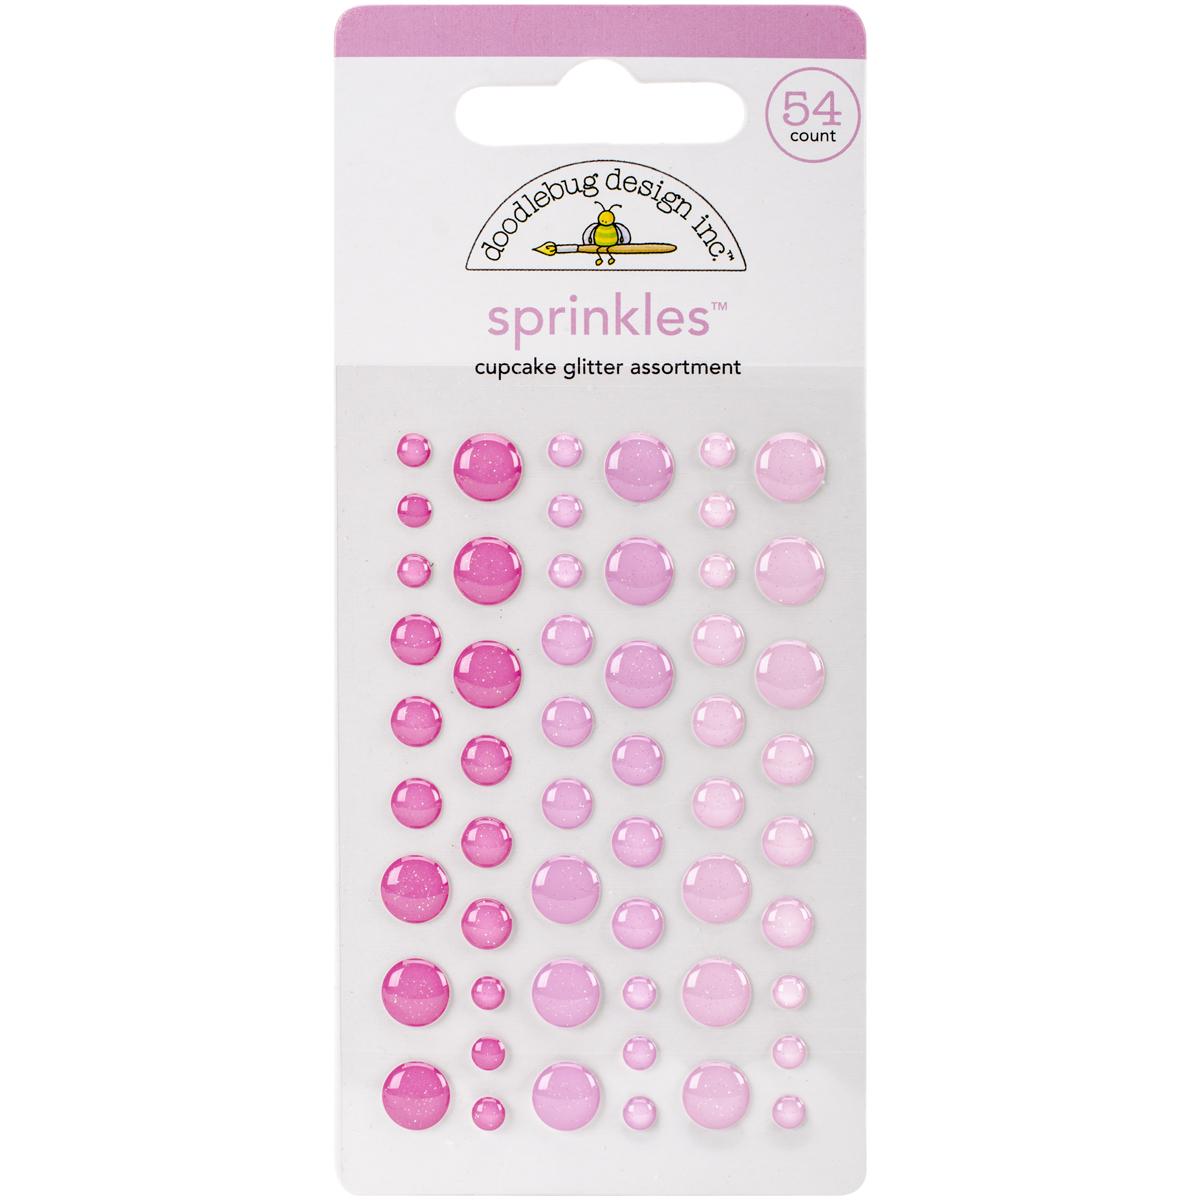 Doodlebug Sprinkles Adhesive Glitter Enamel Dots 54/Pkg-Cupcake